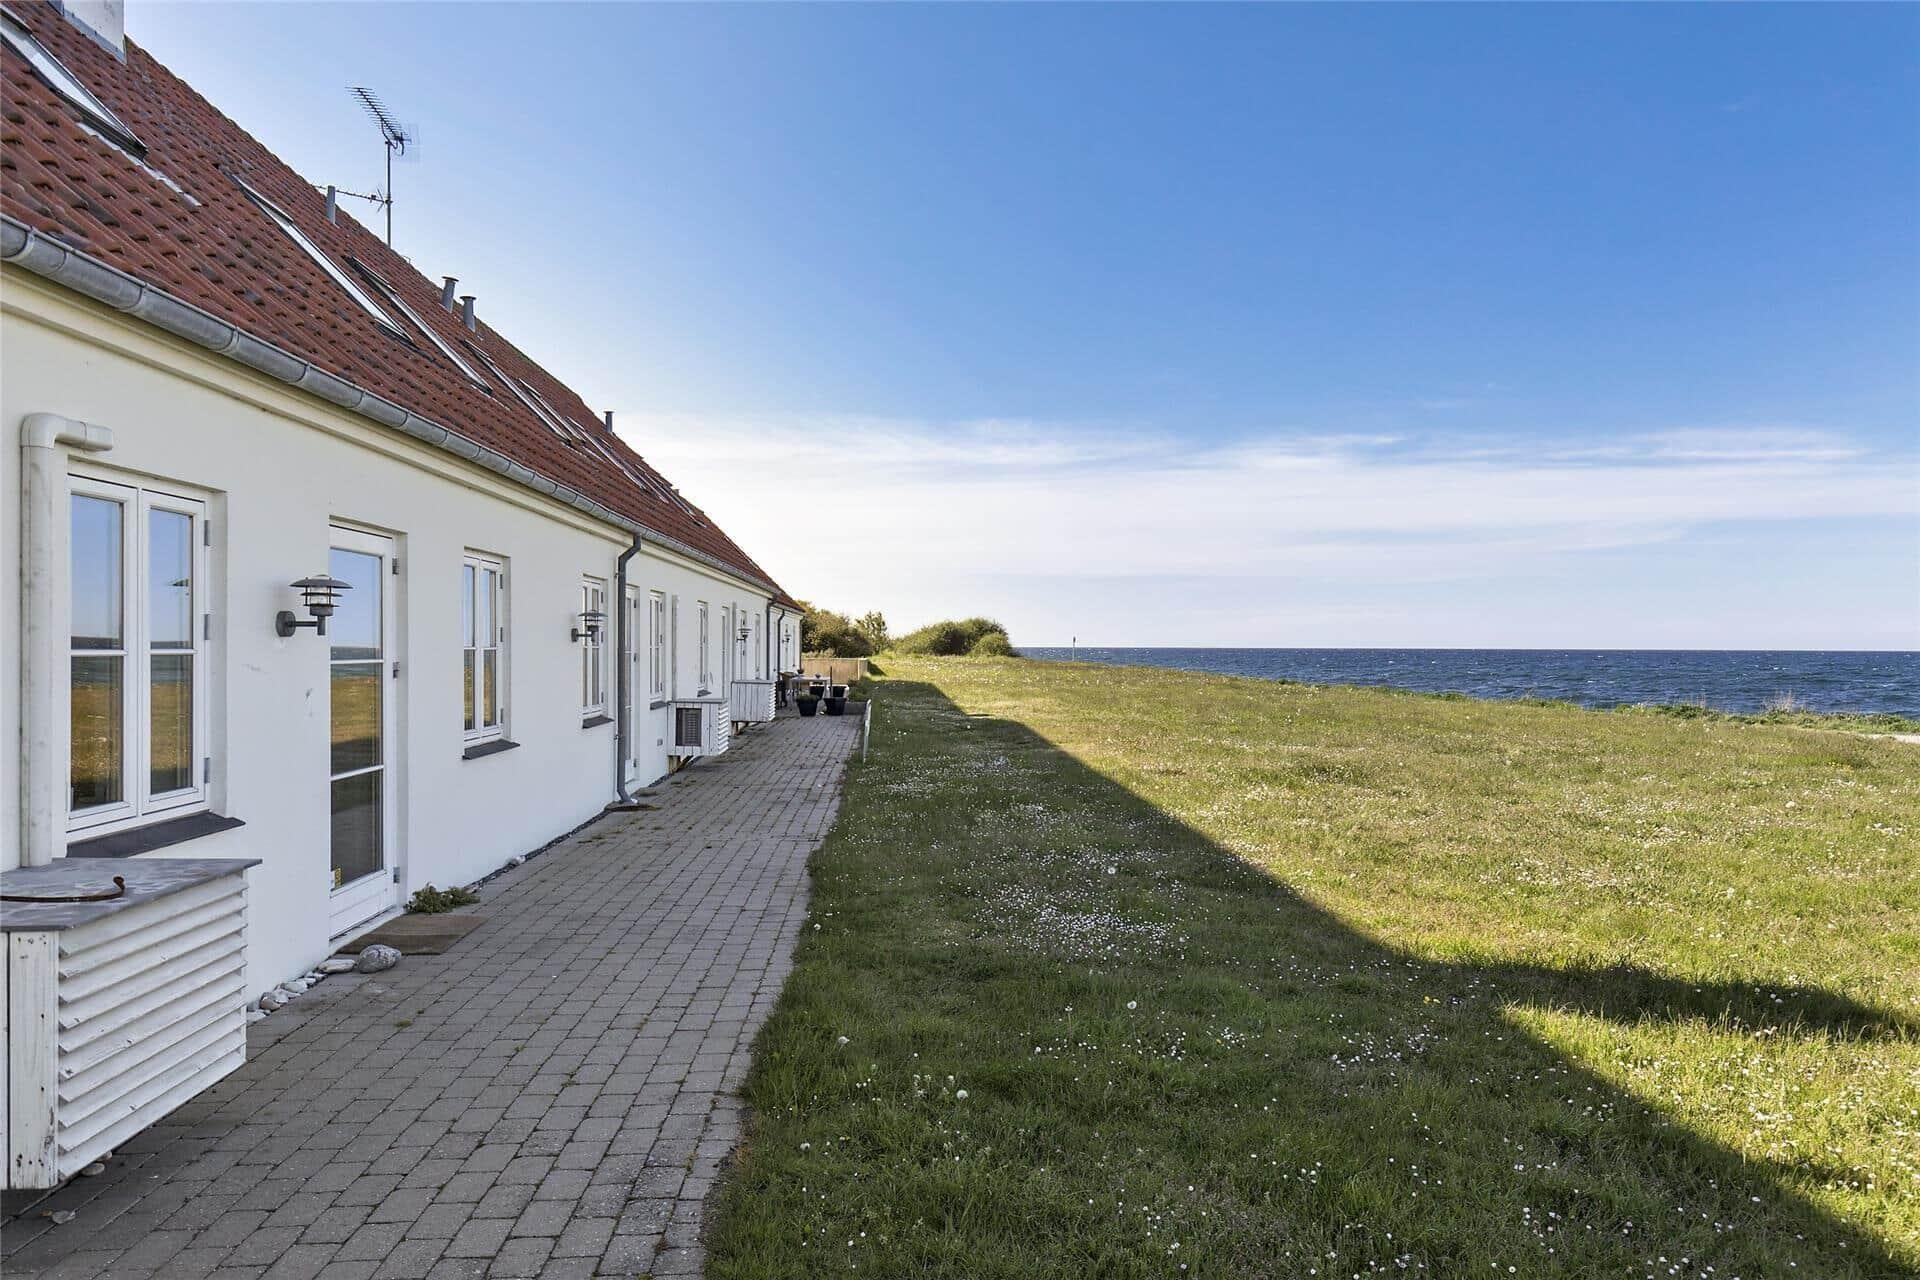 Bild 1-17 Ferienhaus 11835, Klint Havnevej 13, DK - 4500 Nykøbing Sj